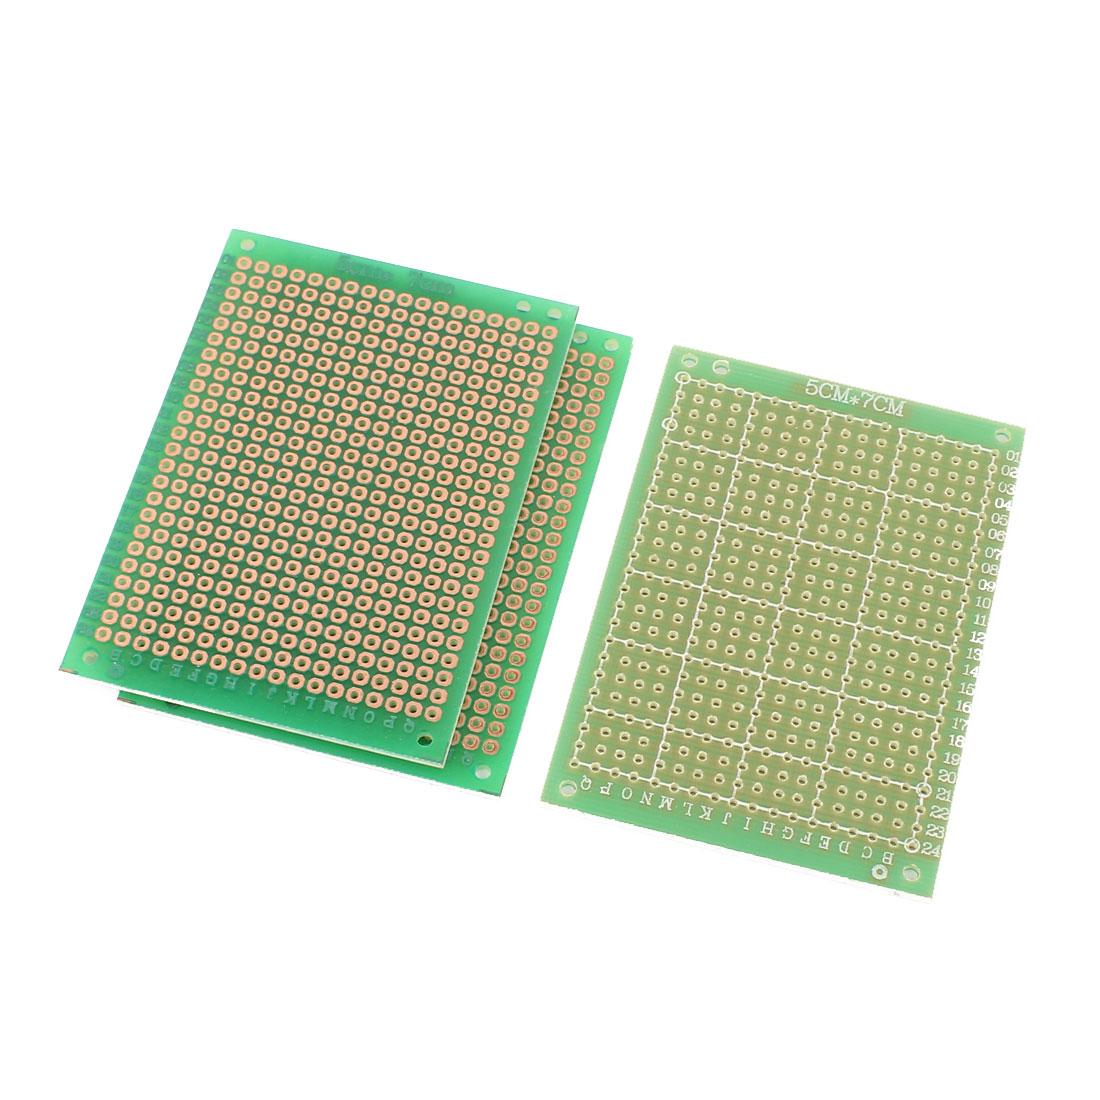 3 Pcs Prototype Universal PCB Print Circuit Board 5CM x 7CM Green